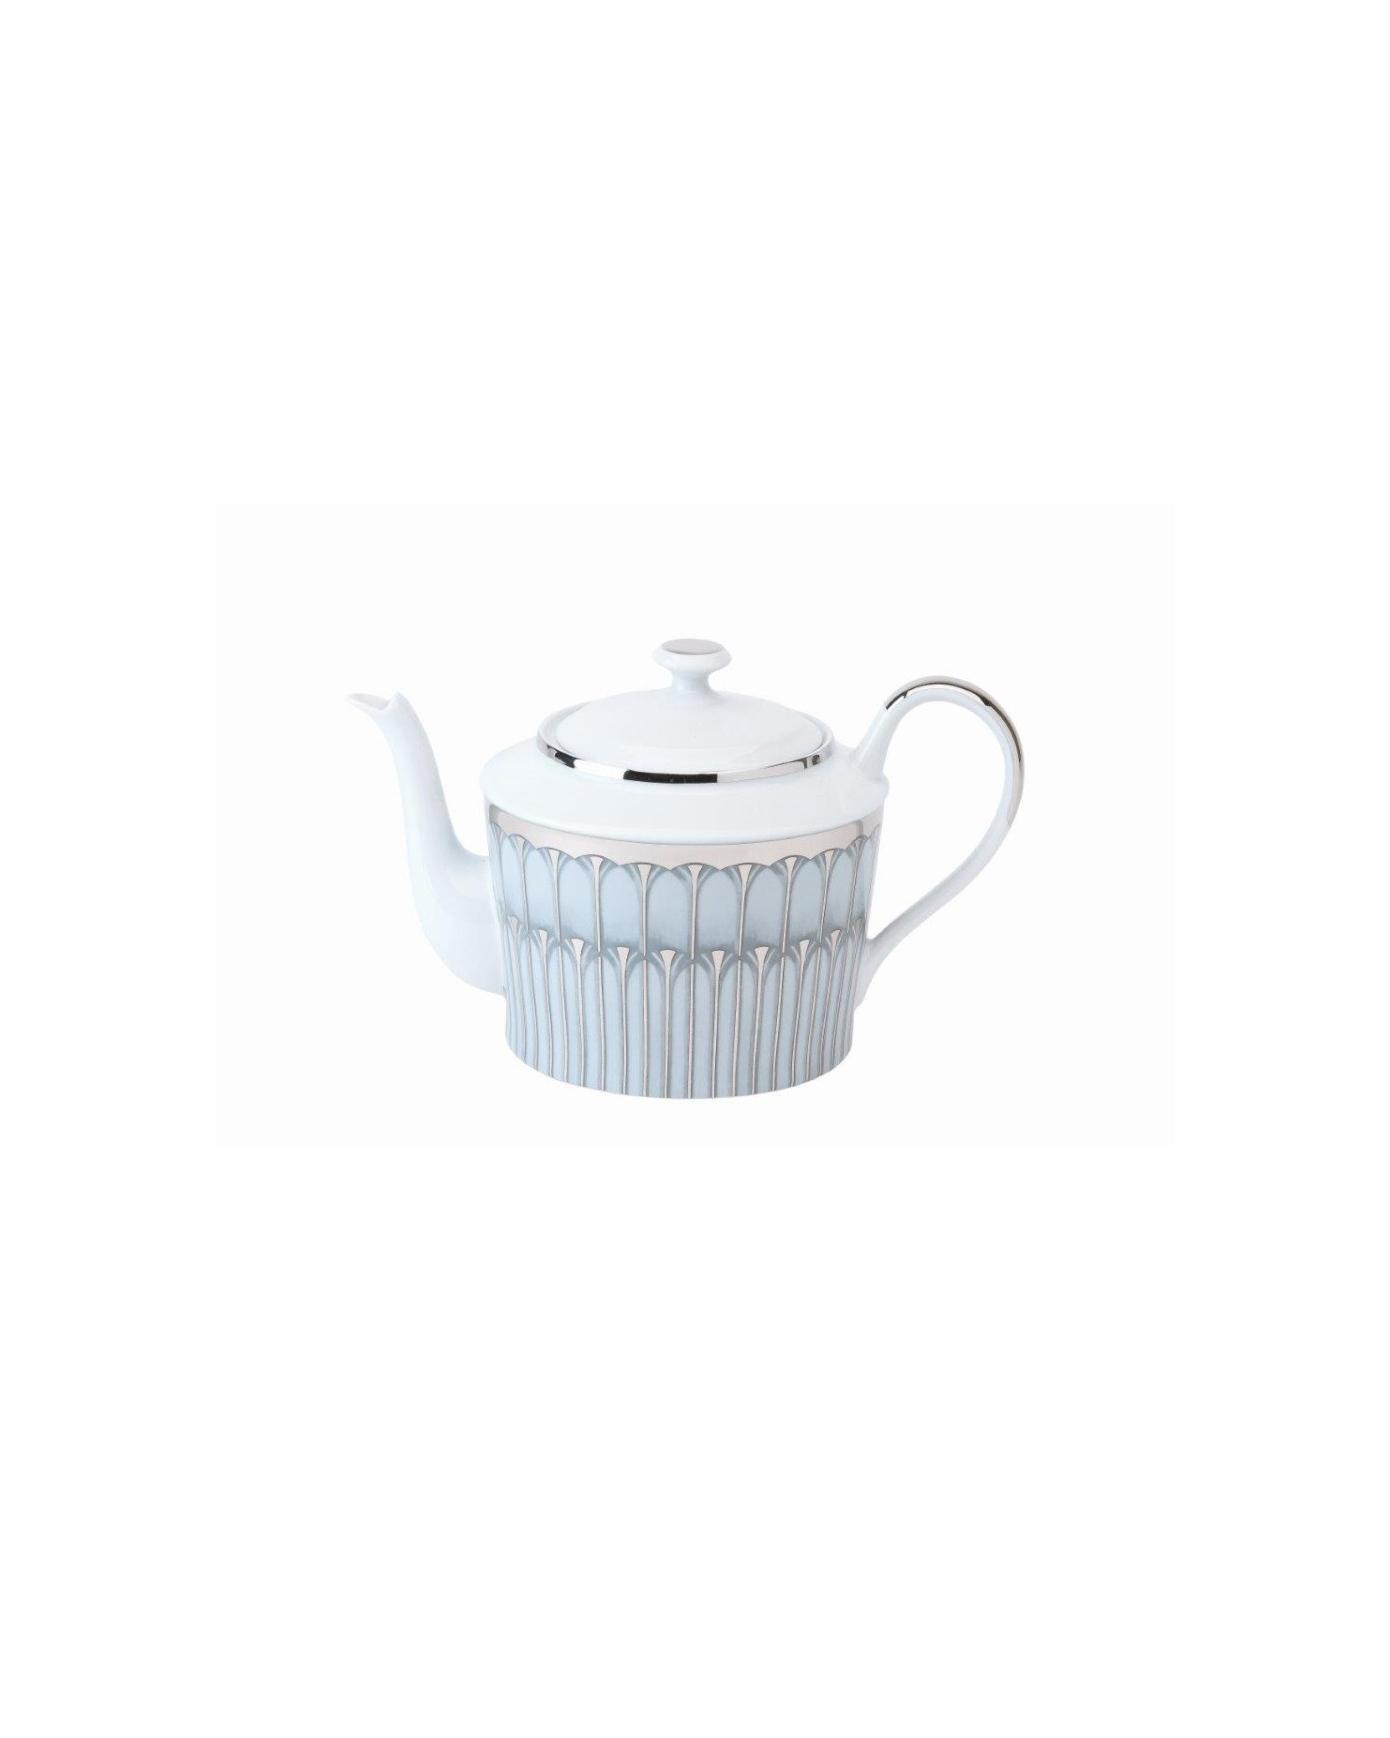 platinum anniversary gifts teapot deshoulieres